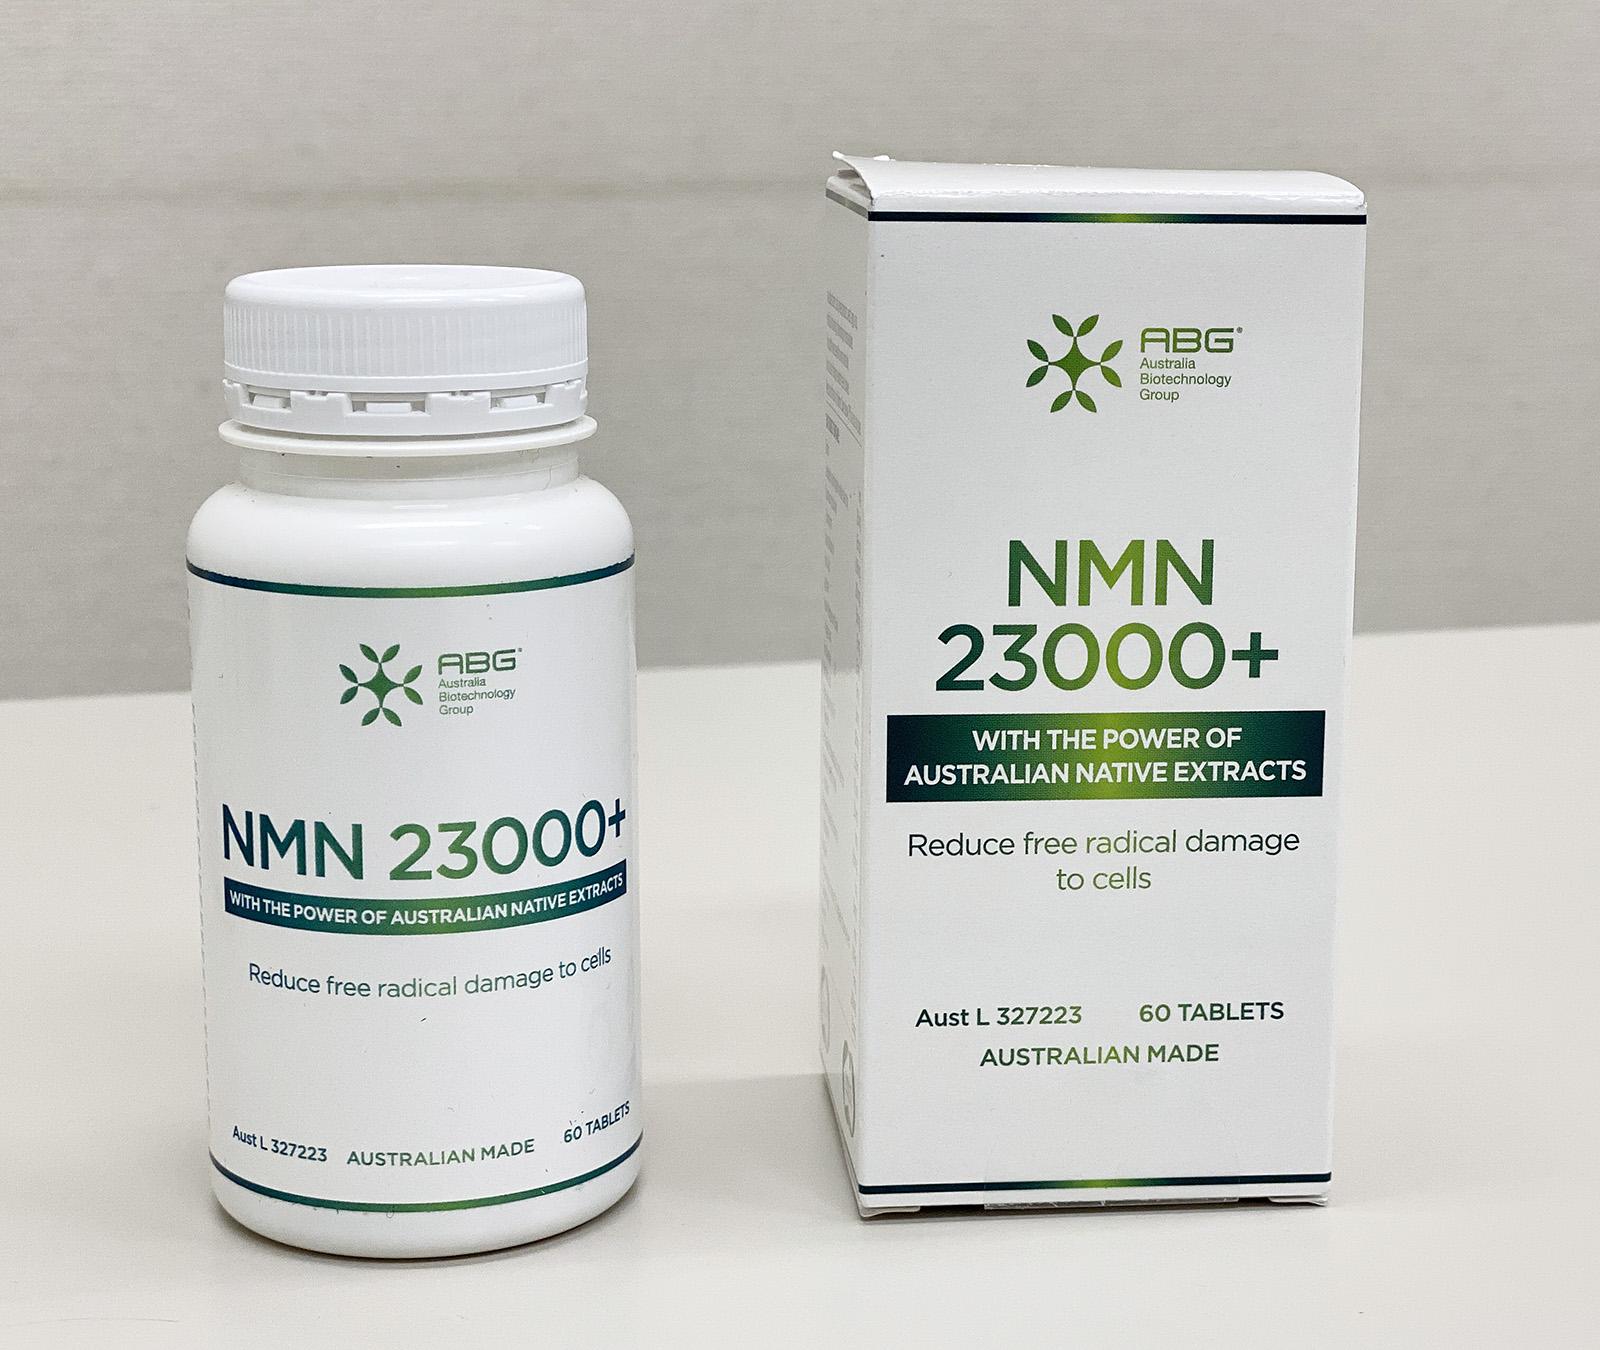 ABG社製 NMNサプリ「NMN 23000+」60錠入【送料込み】